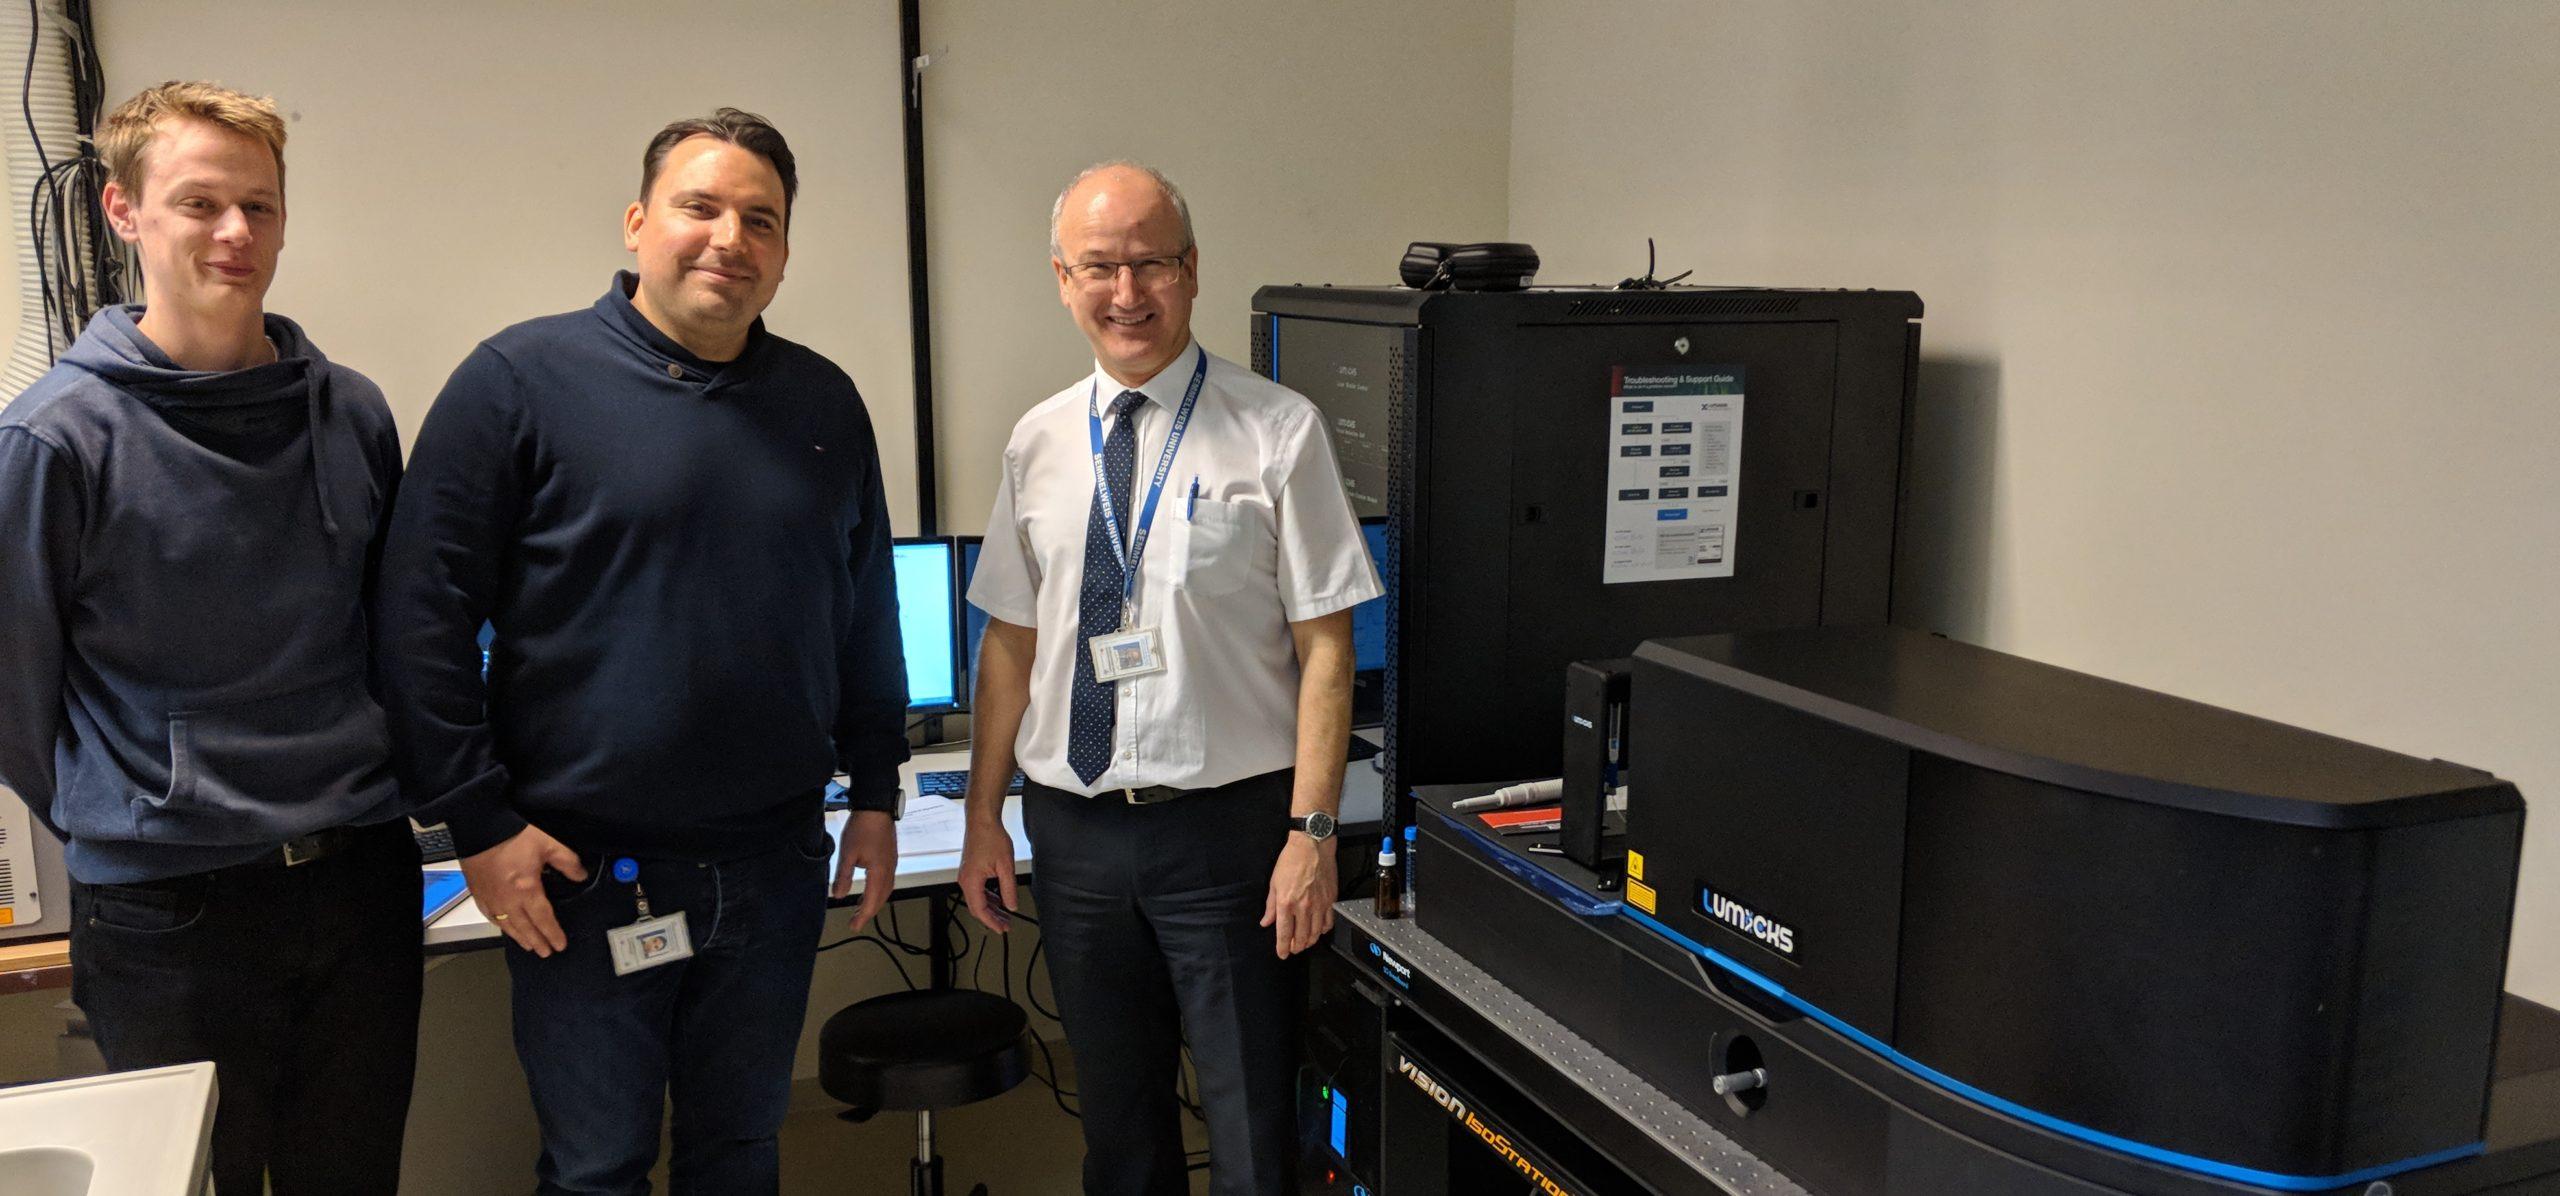 C-Trap™ installed at Semmelweis University